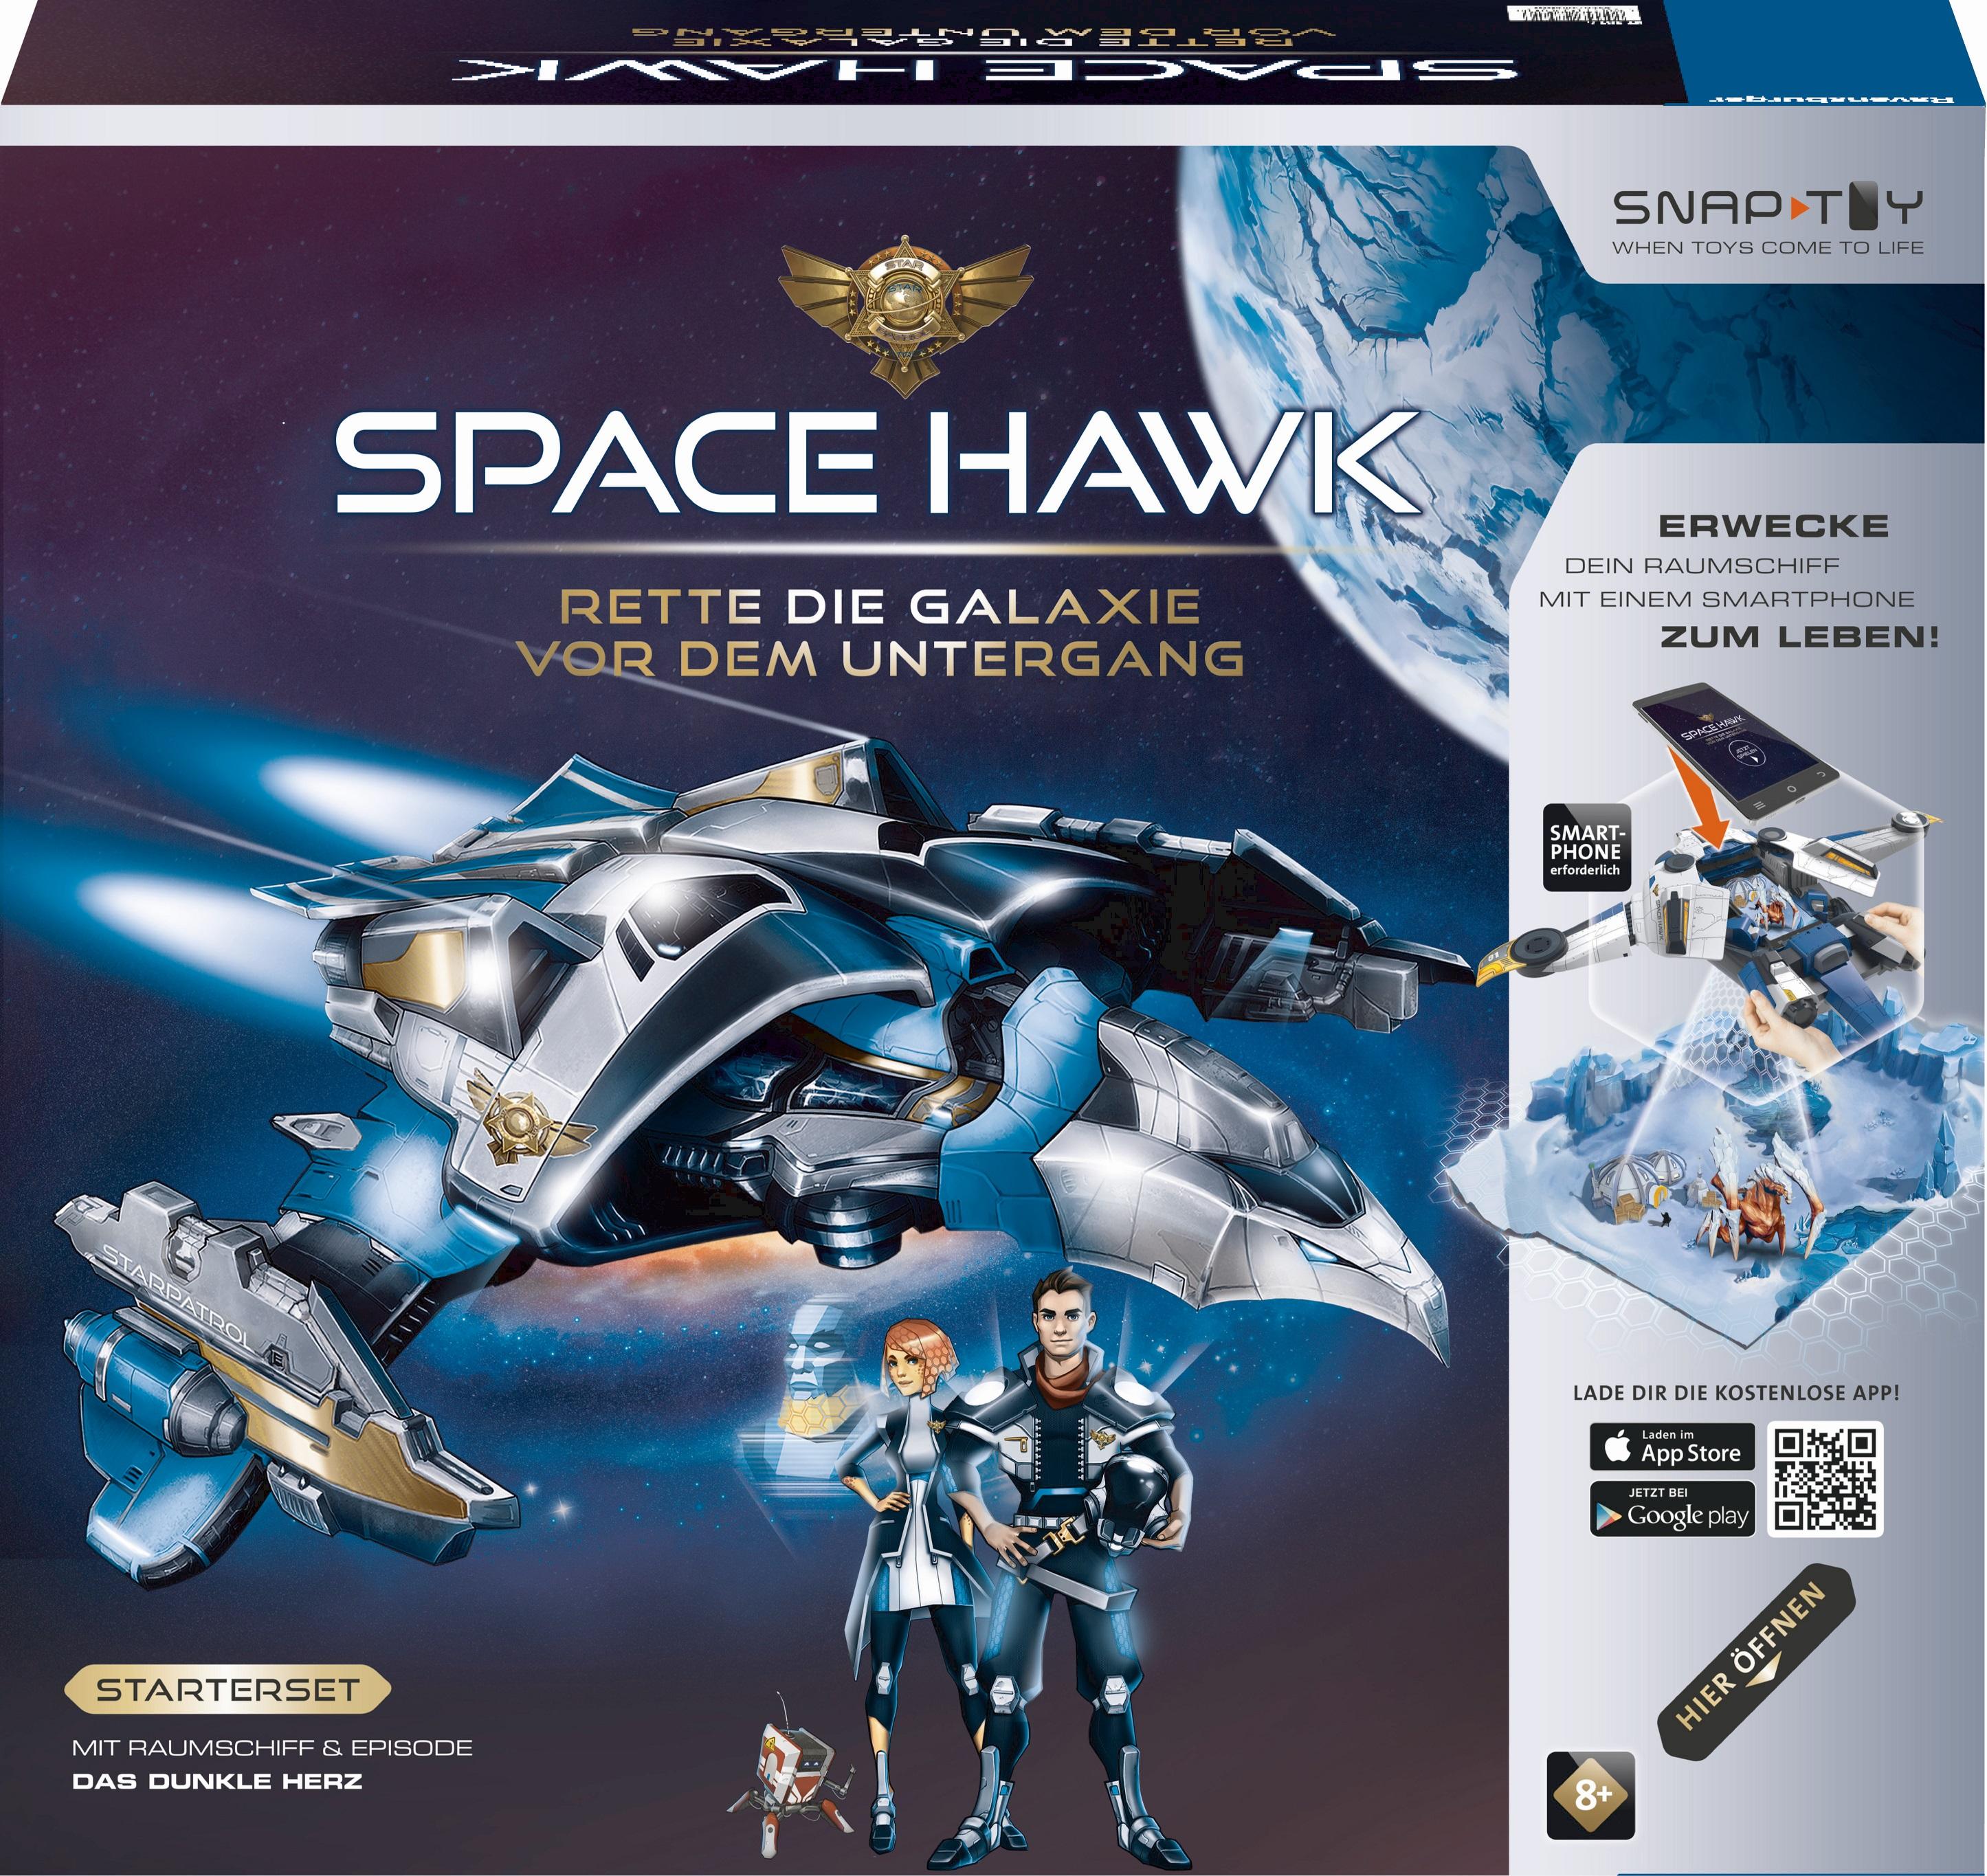 SPACE HAWK_packung